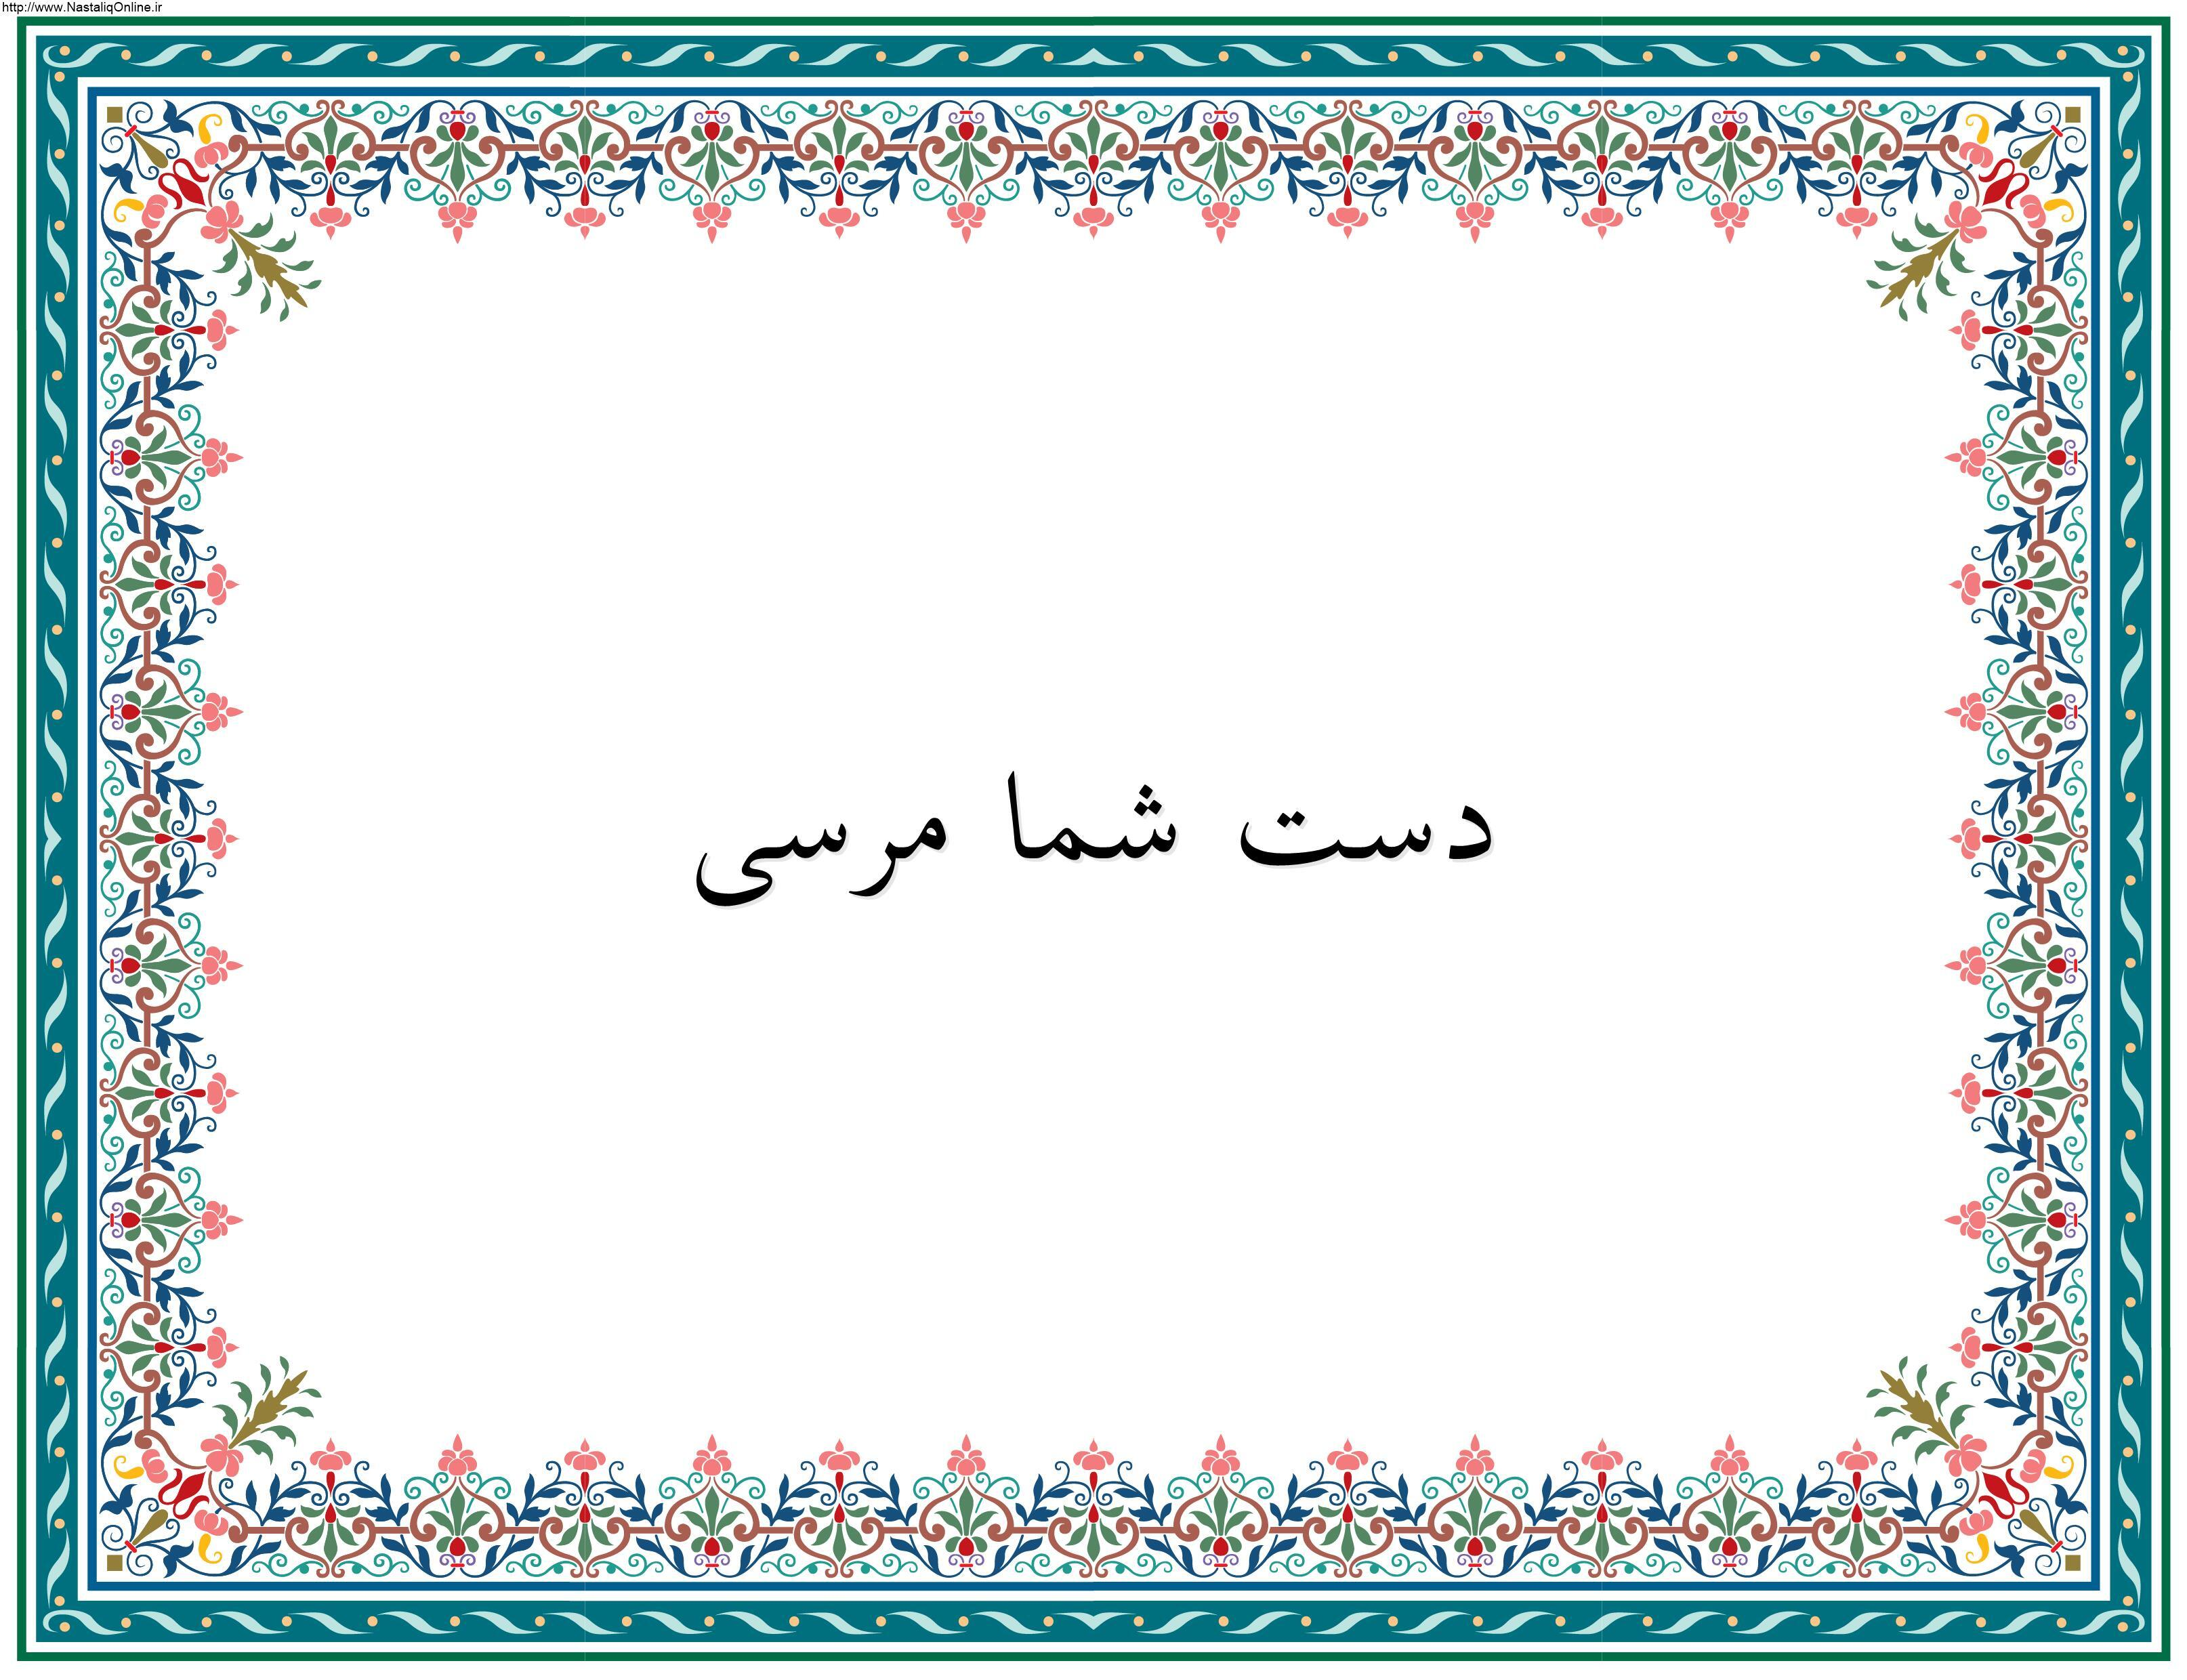 kfe_nastaliqonline.ir-_4_.jpg